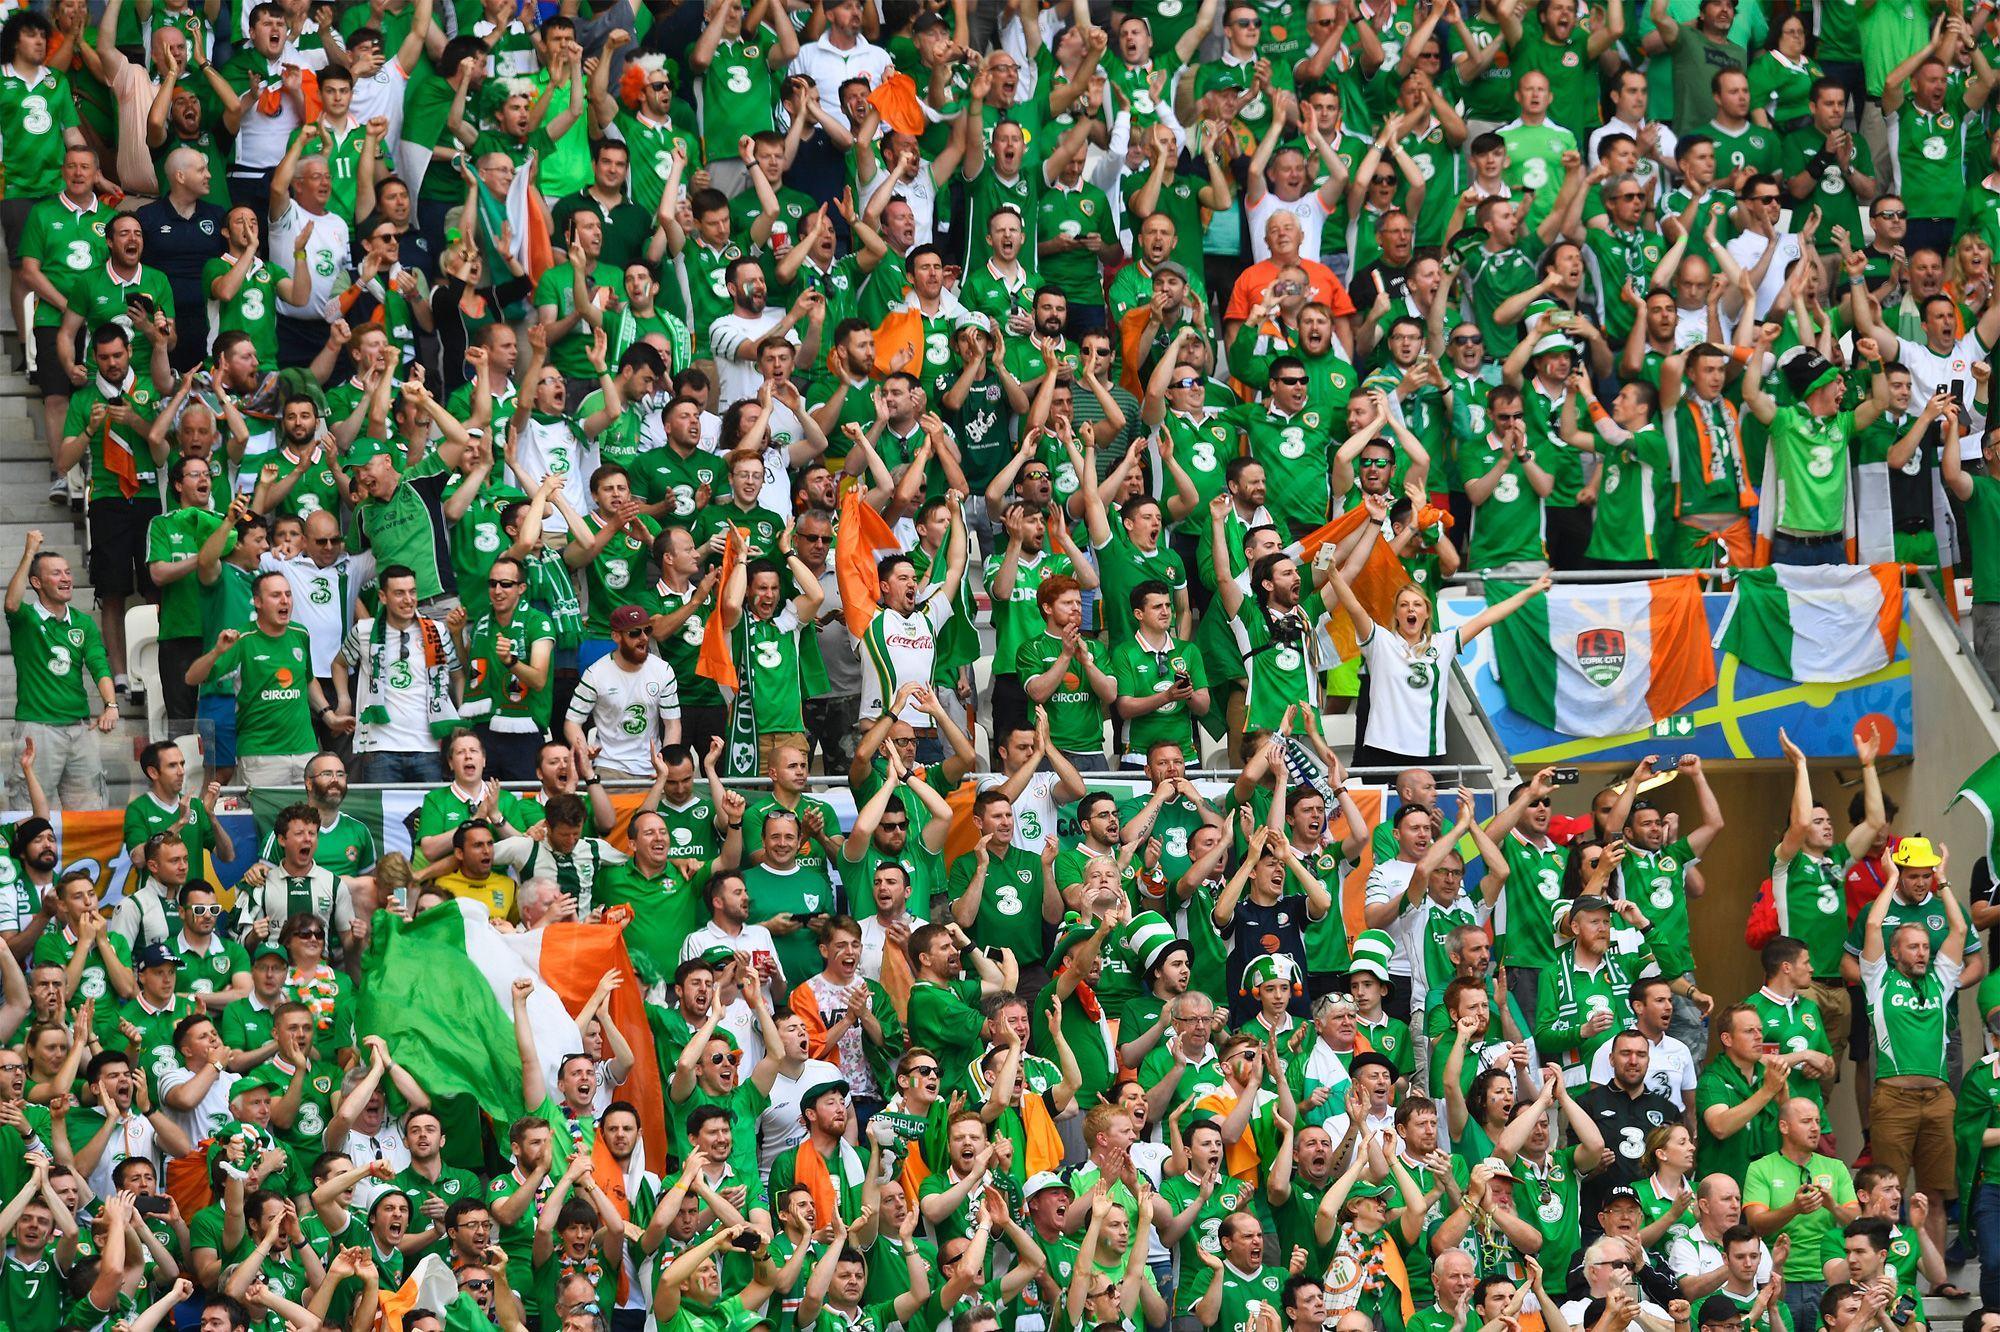 4 balles irlandais